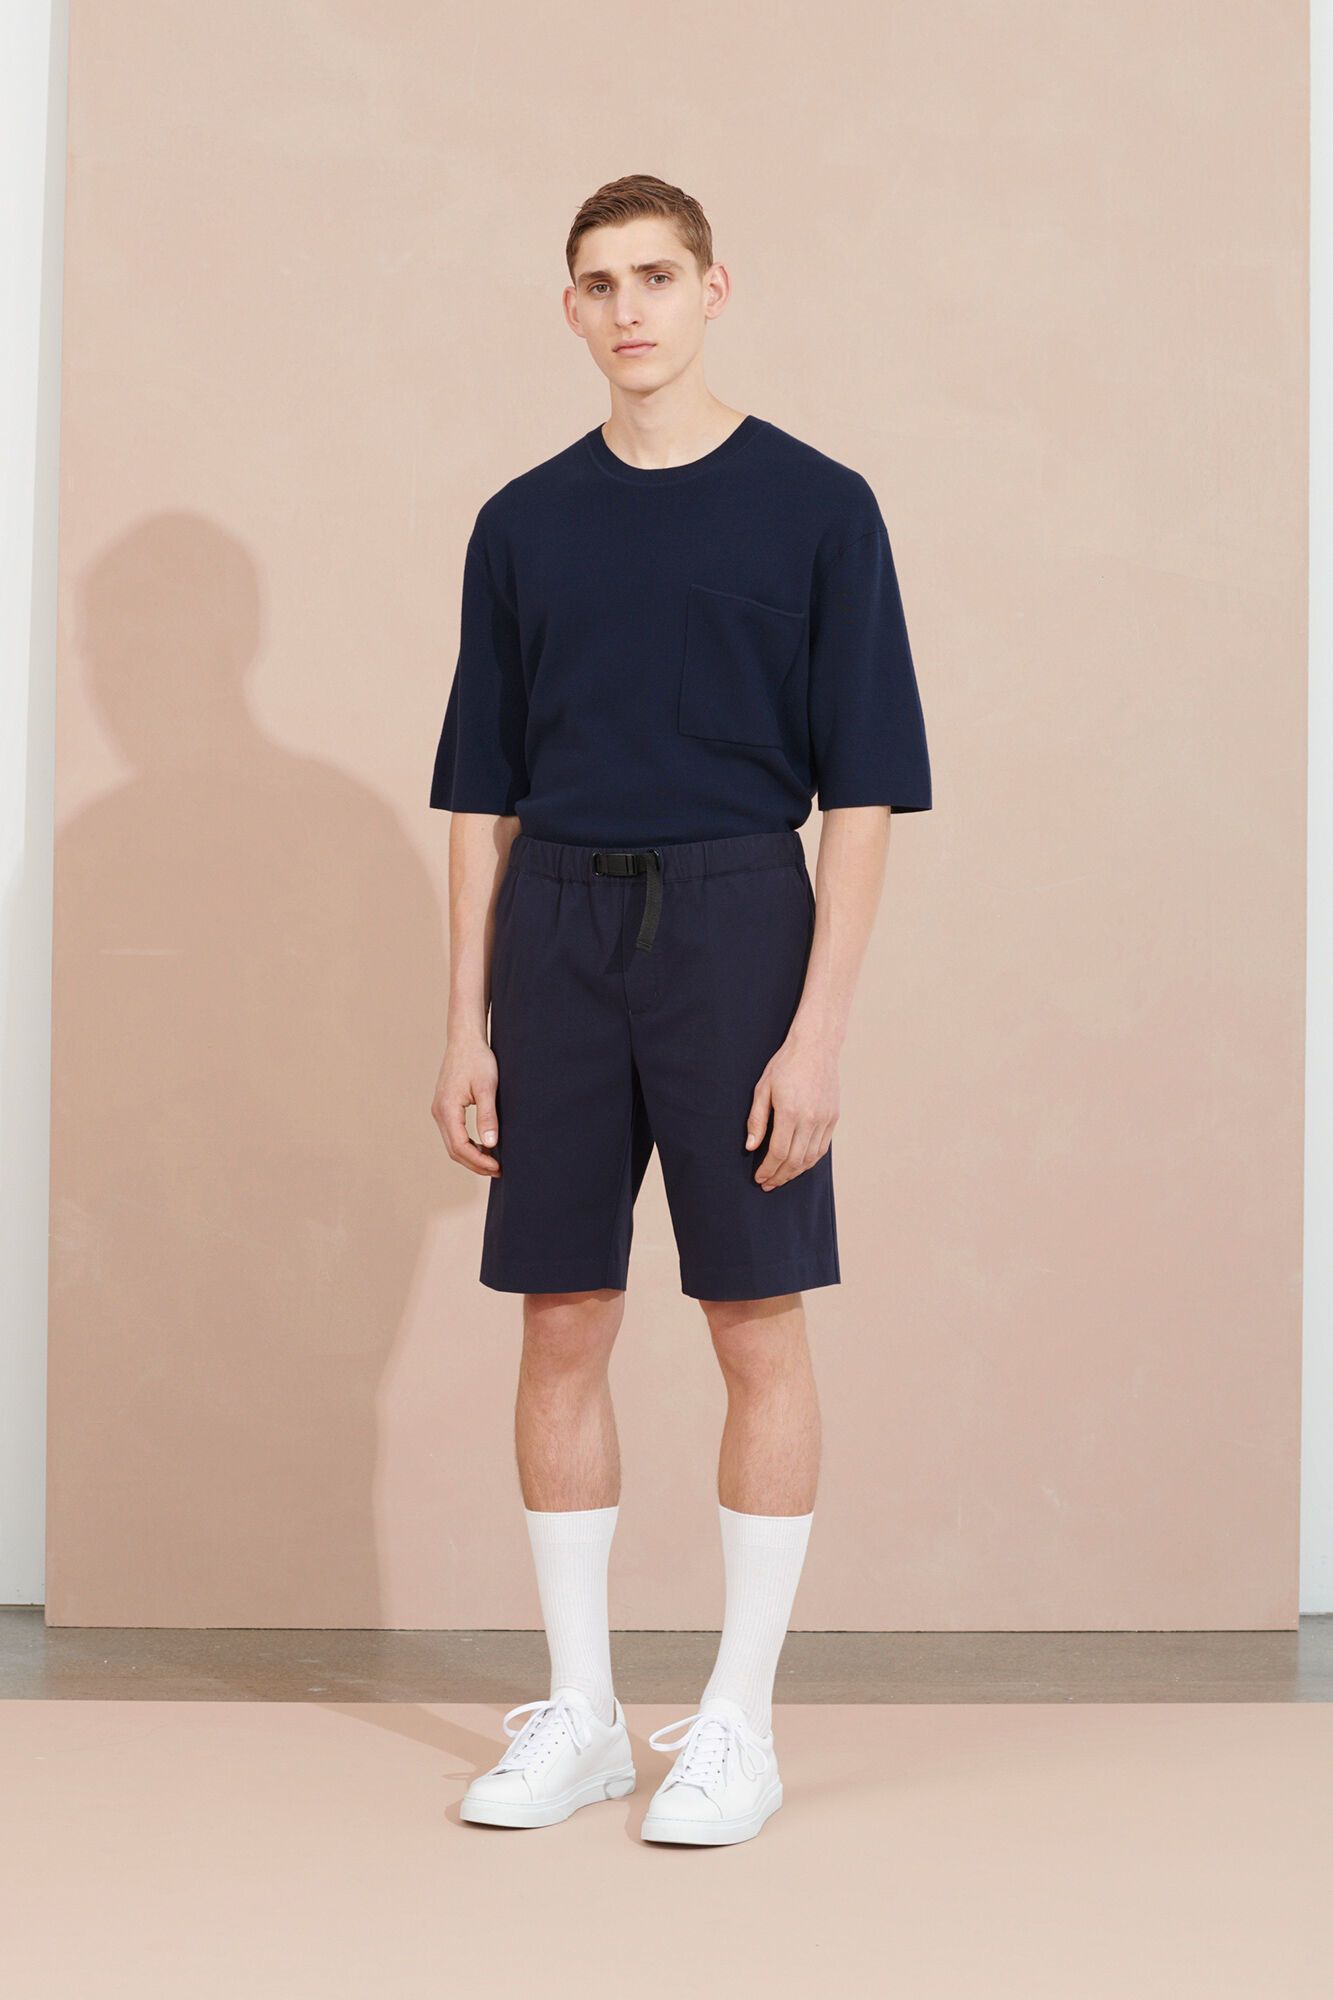 Parma Short Sleeve Sweatshirt Night Sky Blue-3